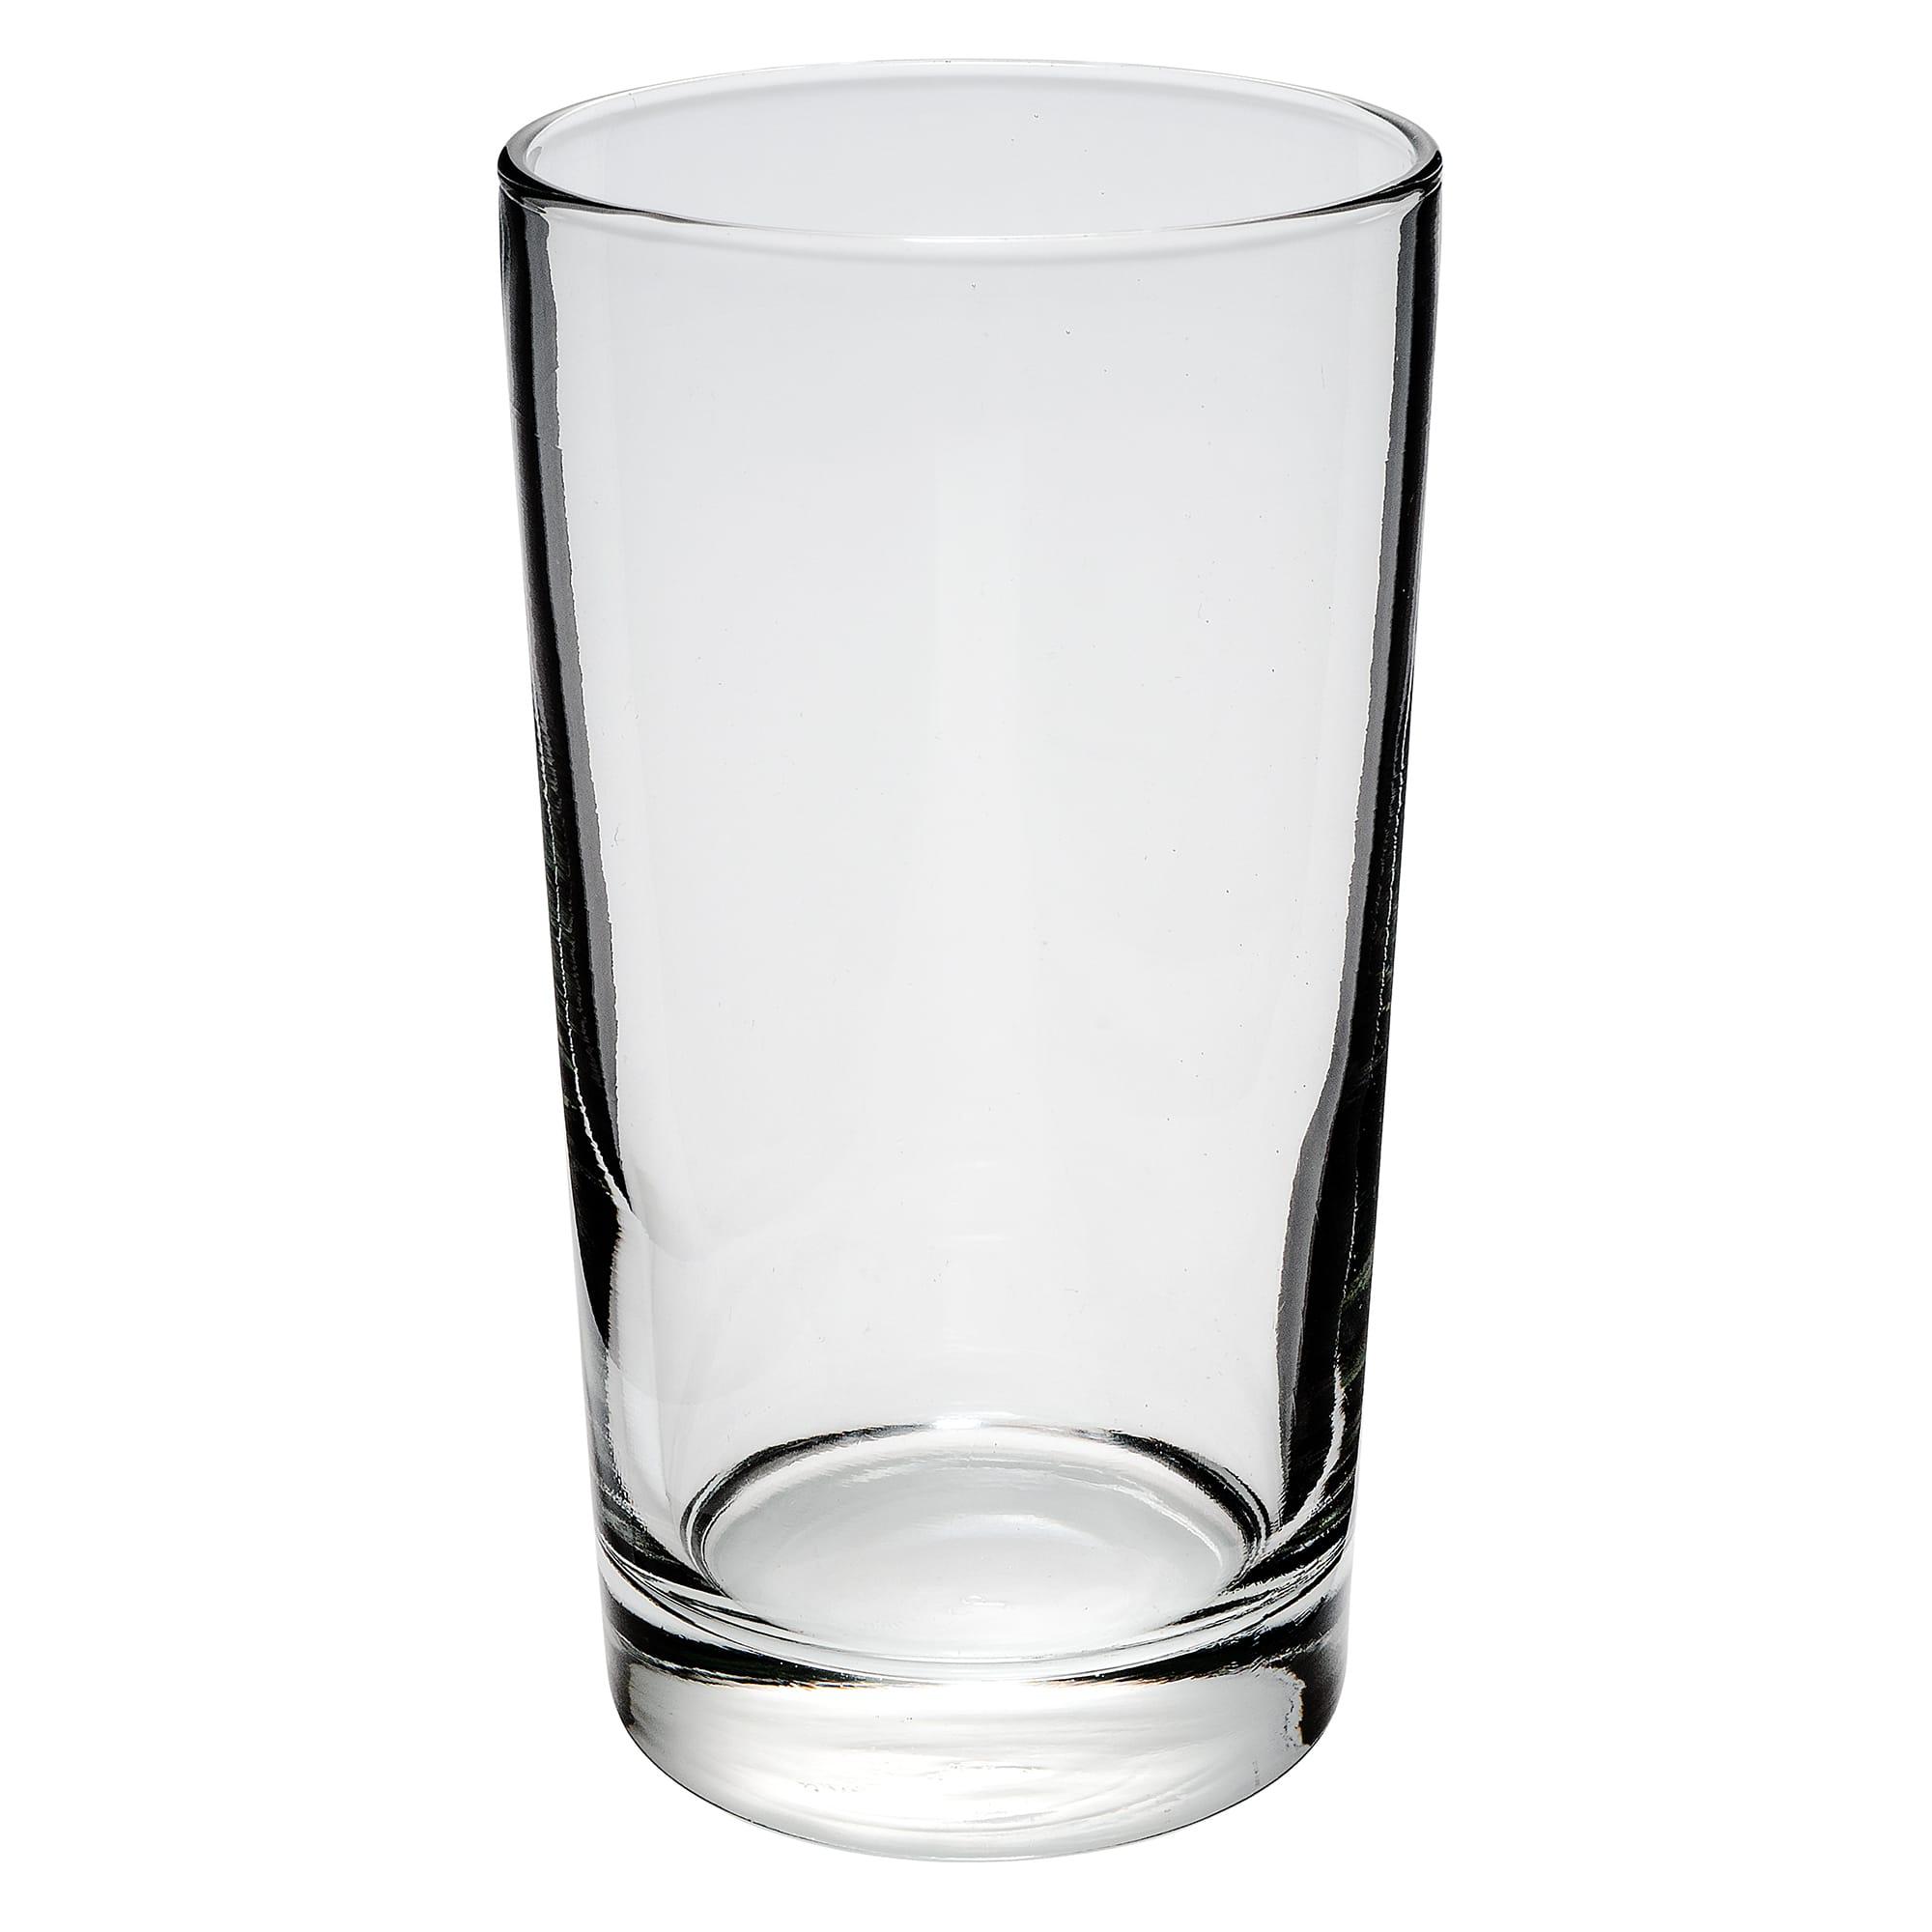 Libbey 125 9-oz Hi-Ball Glass - Safedge Rim Guarantee